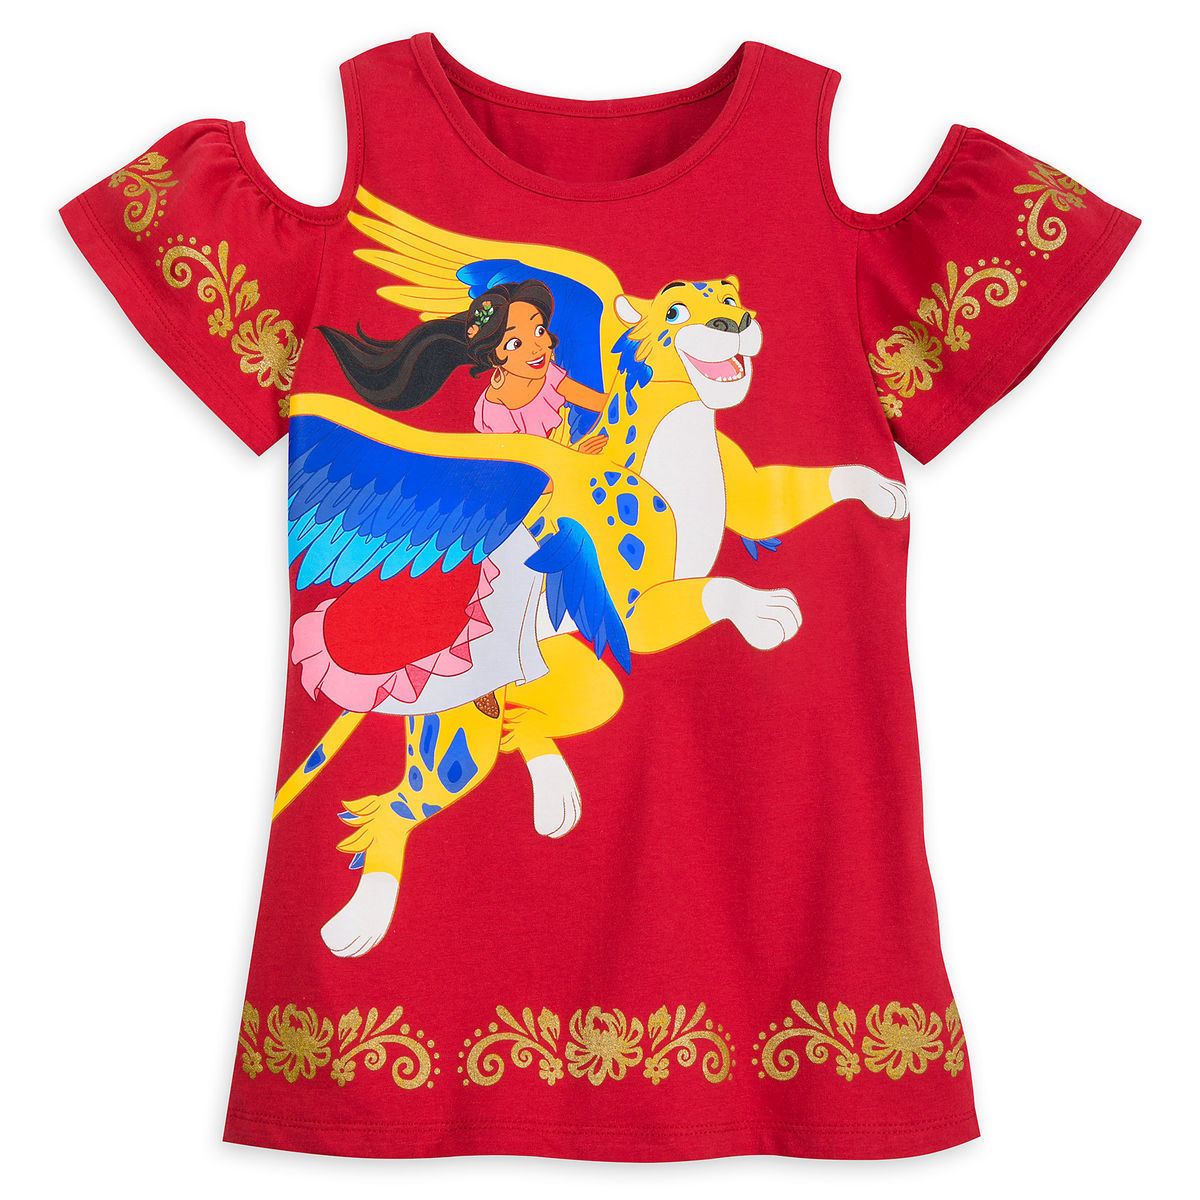 09fce144 Disney Shirt for Girls - Elena and Skylar - Elena of Avalor - Red